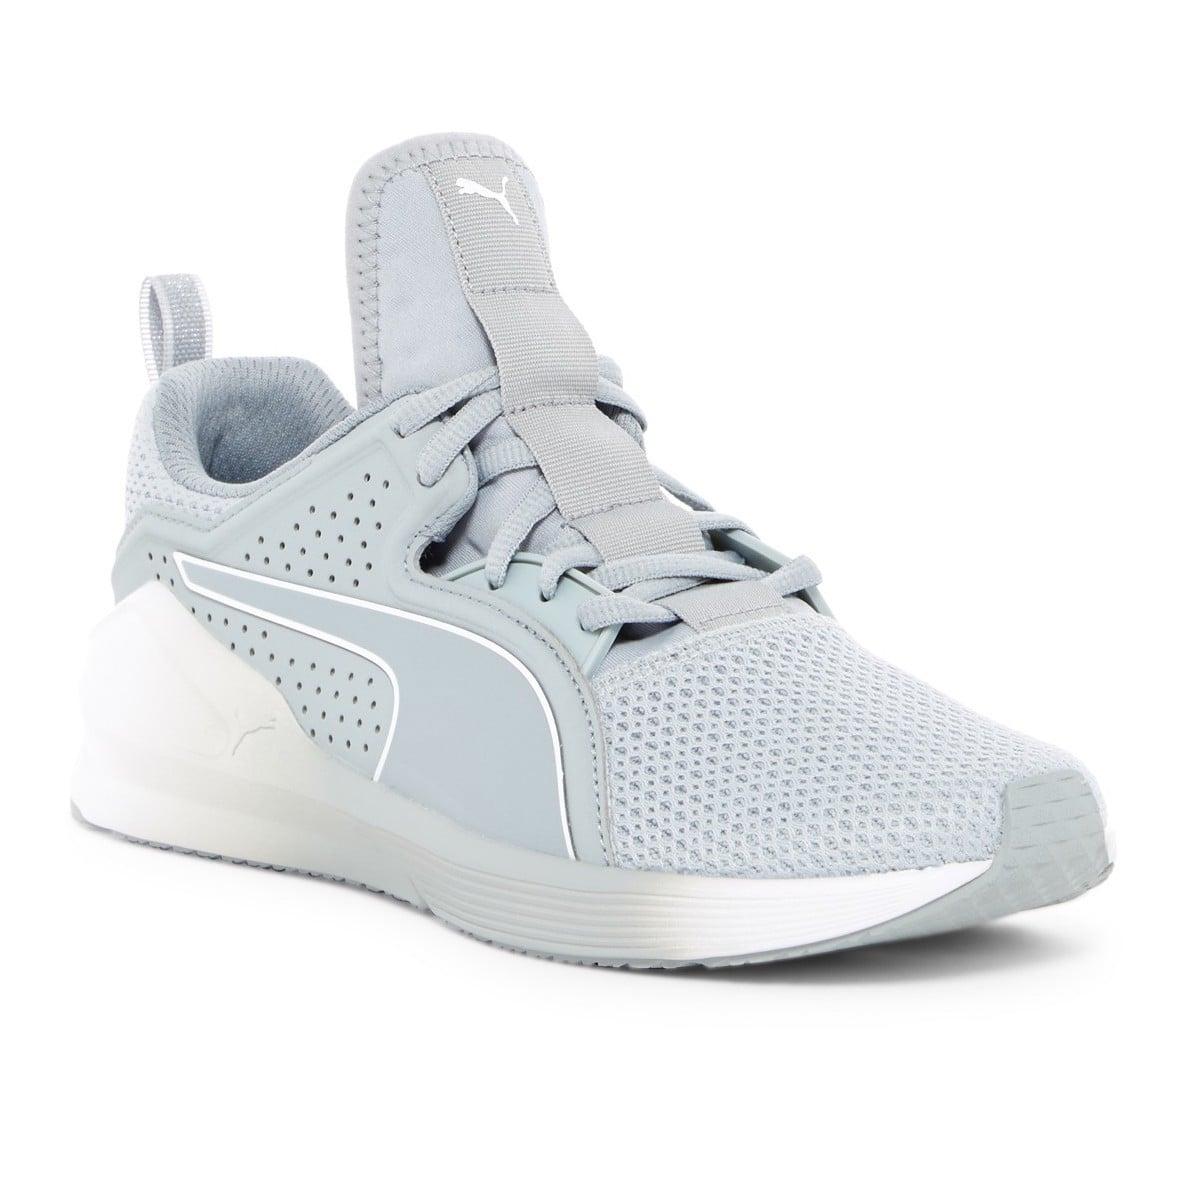 Puma Fierce Lace Sneakers   Important